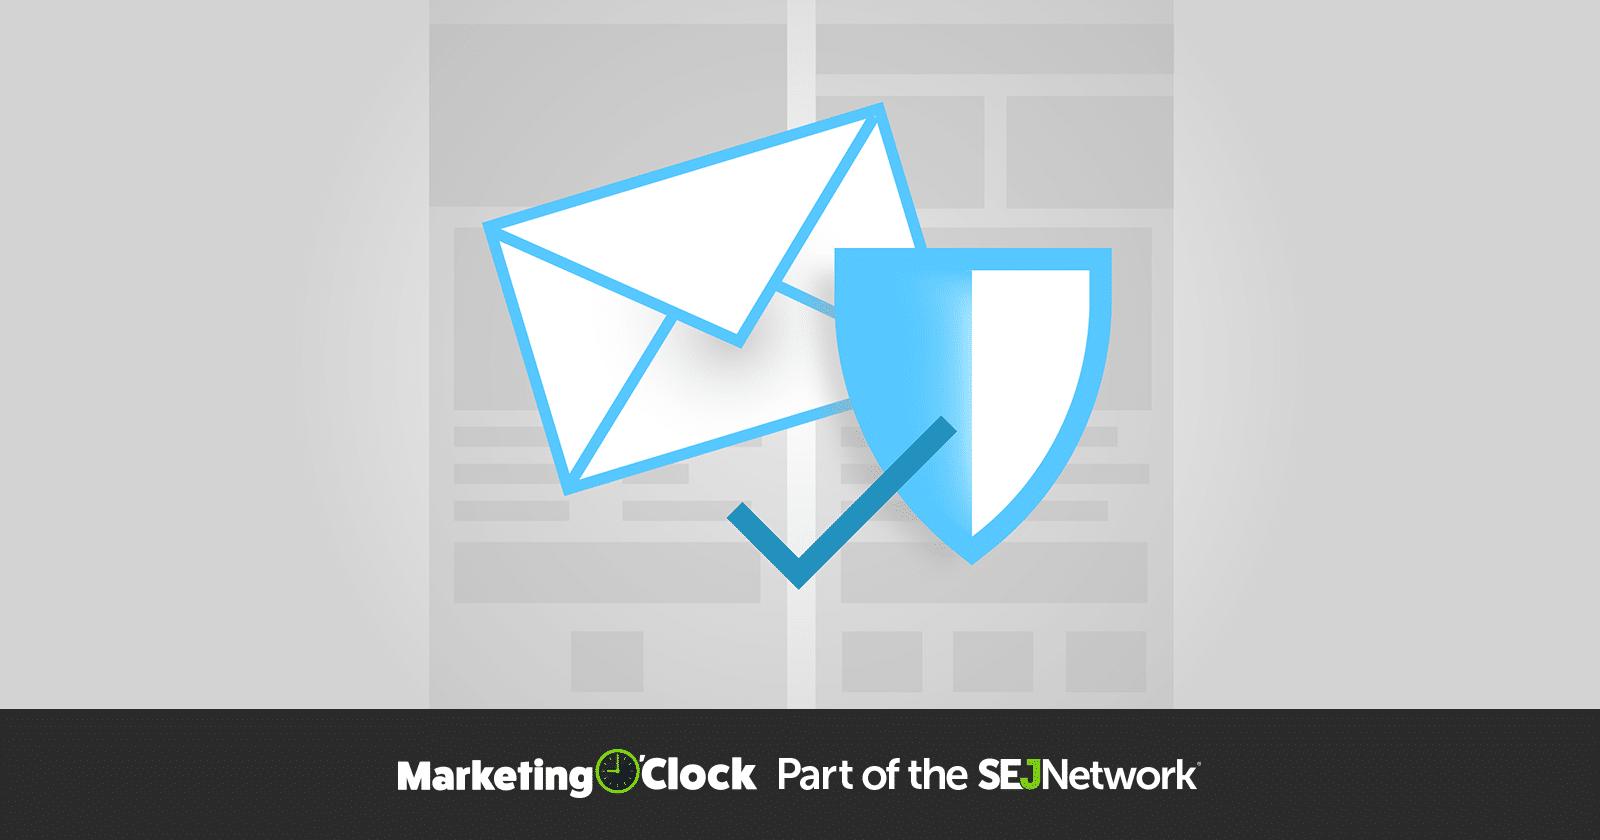 Apple Mail to Block Email Tracking Pixels & More Digital Marketing News via @sejournal, @shepzirnheld